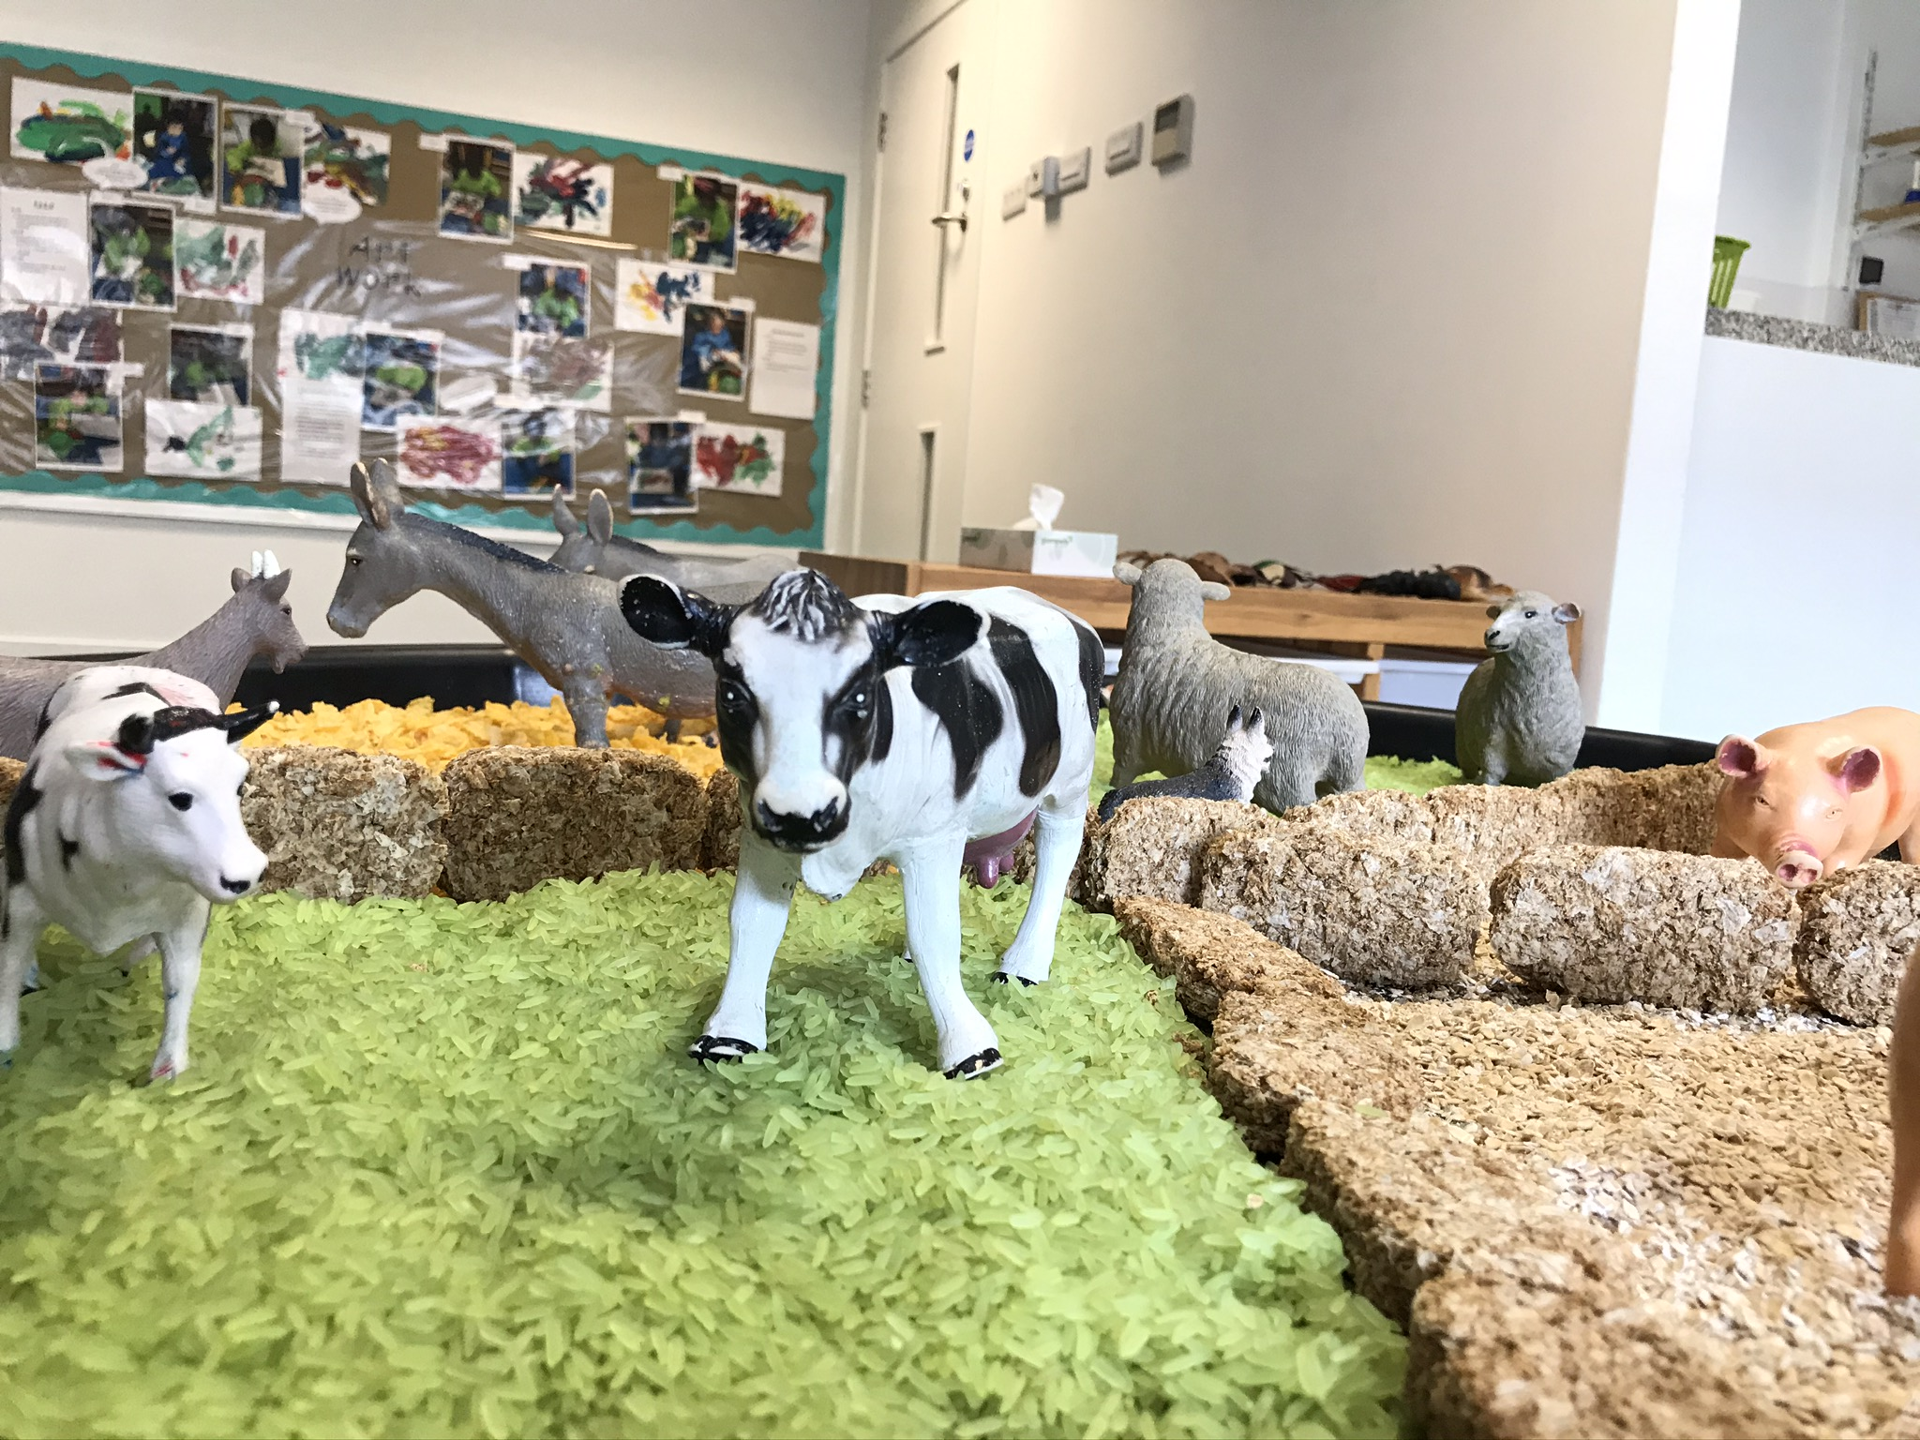 Farmyard animals in nursery toddler's room